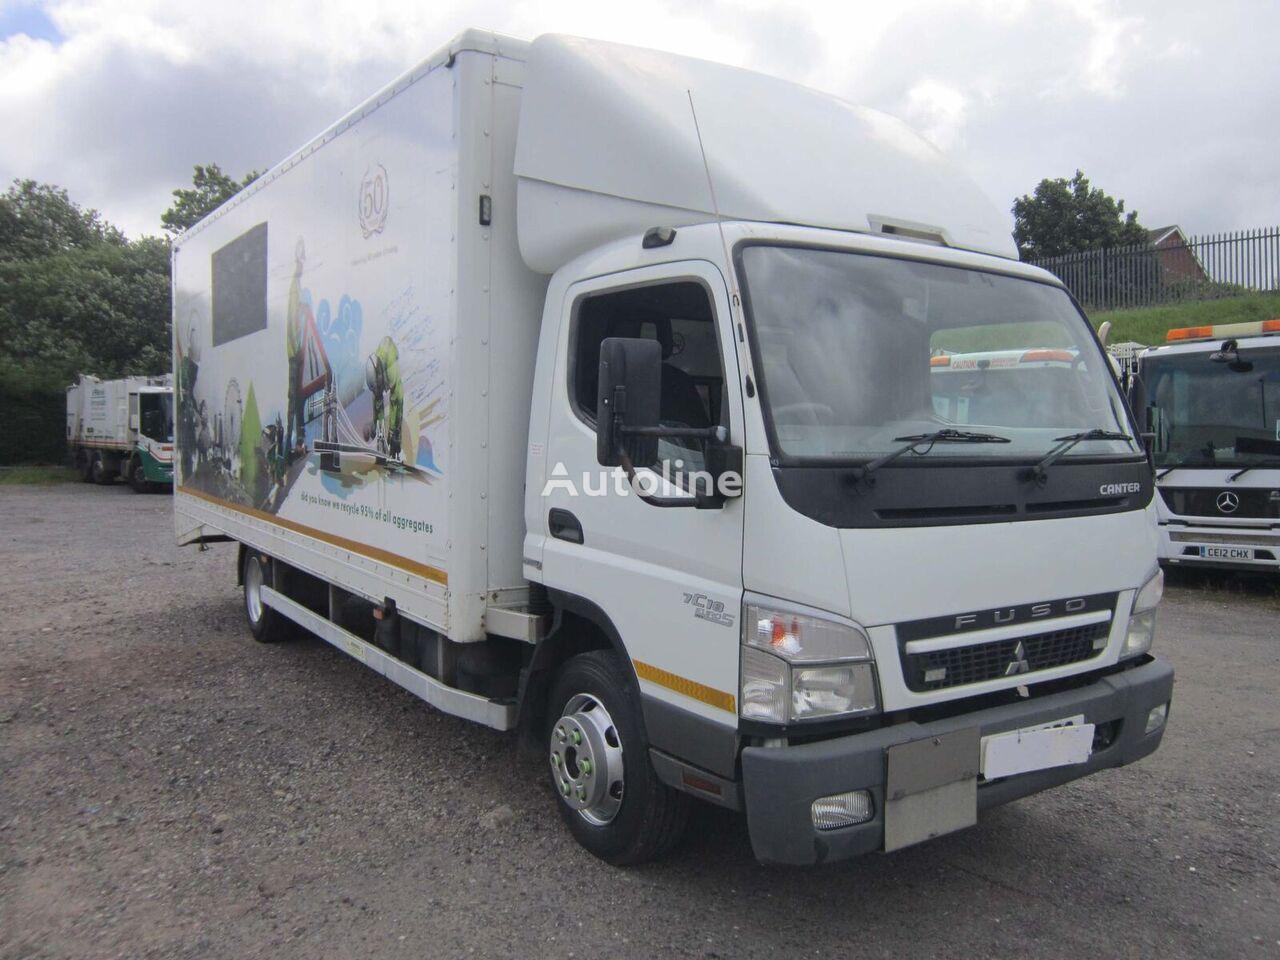 Mitsubishi Fuso CANTER 7C18 4X2 7.5TON BOX VAN C/W ROLLER SHUTTER DOORS box truck